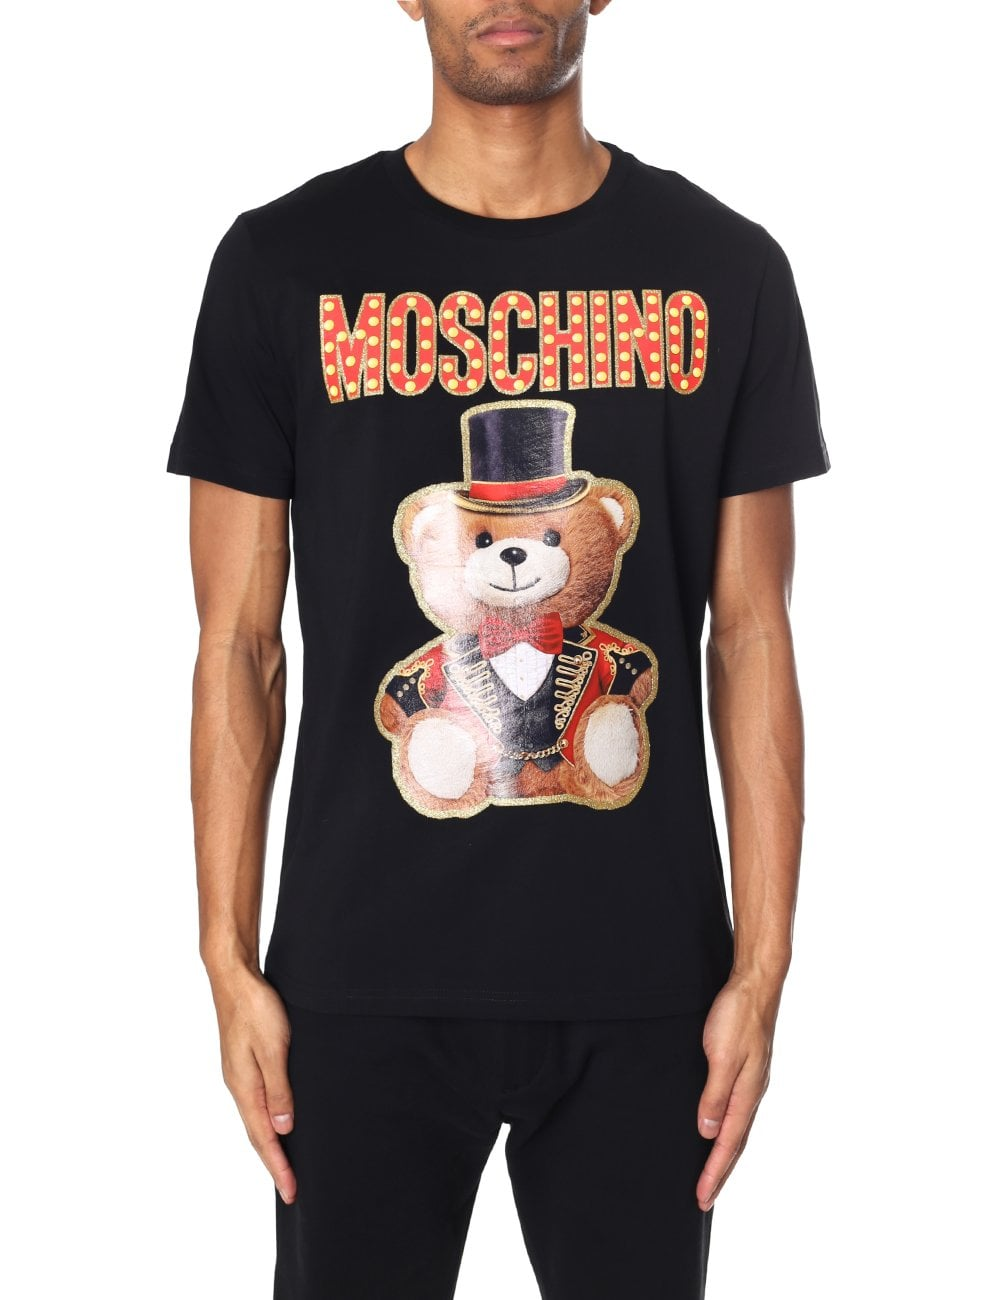 244f8135 Moschino Couture Men's Circus Bear Tee